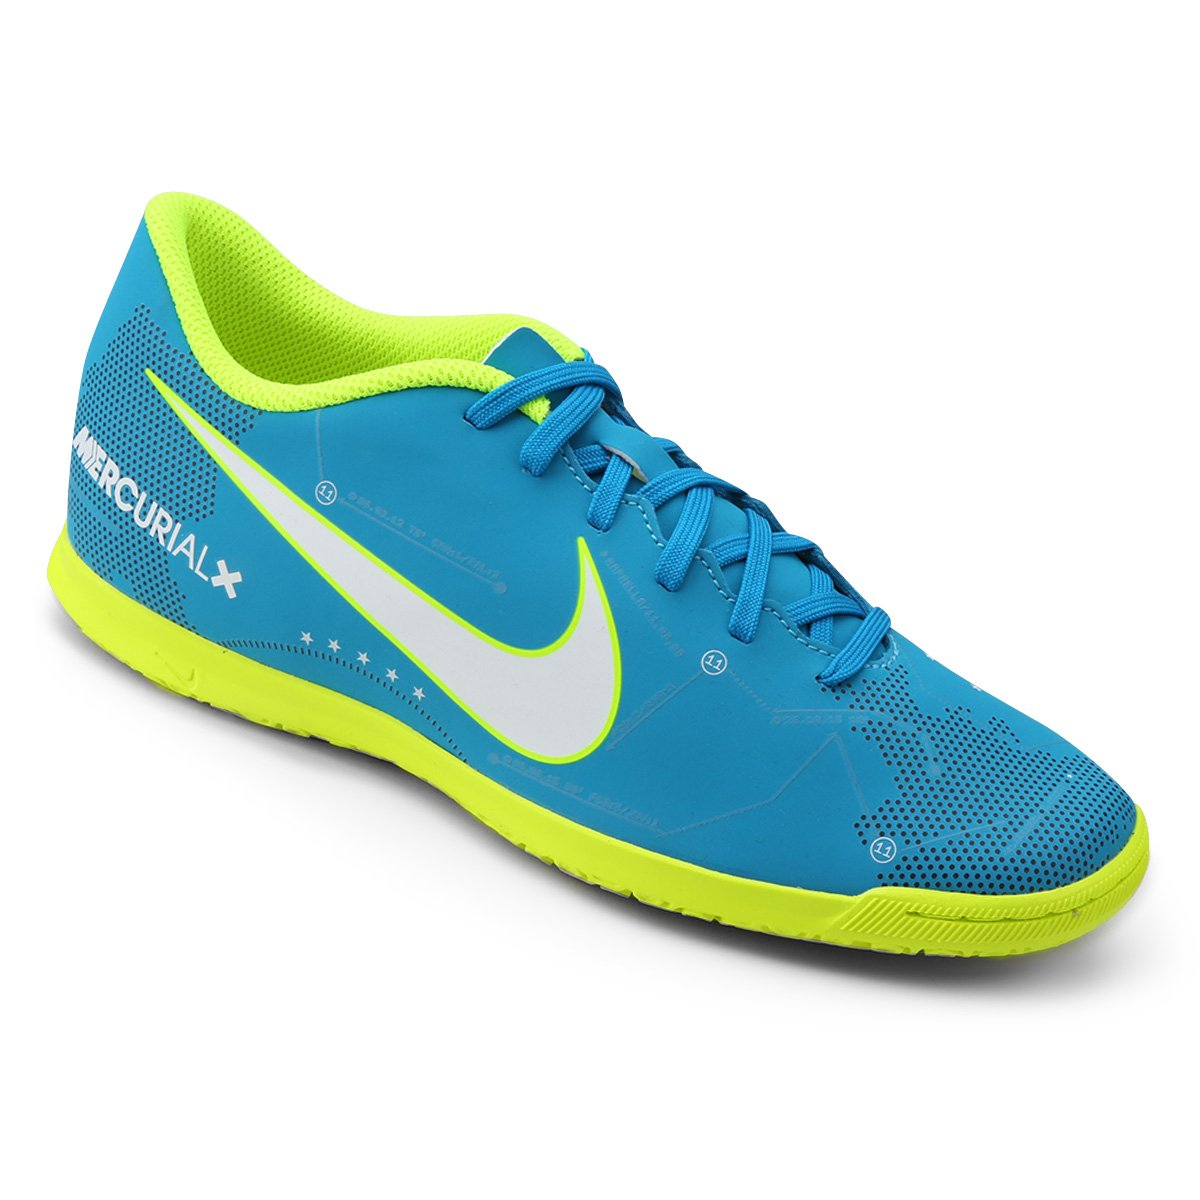 a3bb411c23 Chuteira Futsal Nike Mercurial Vortex 3 Neymar Jr IC - Compre Agora ...